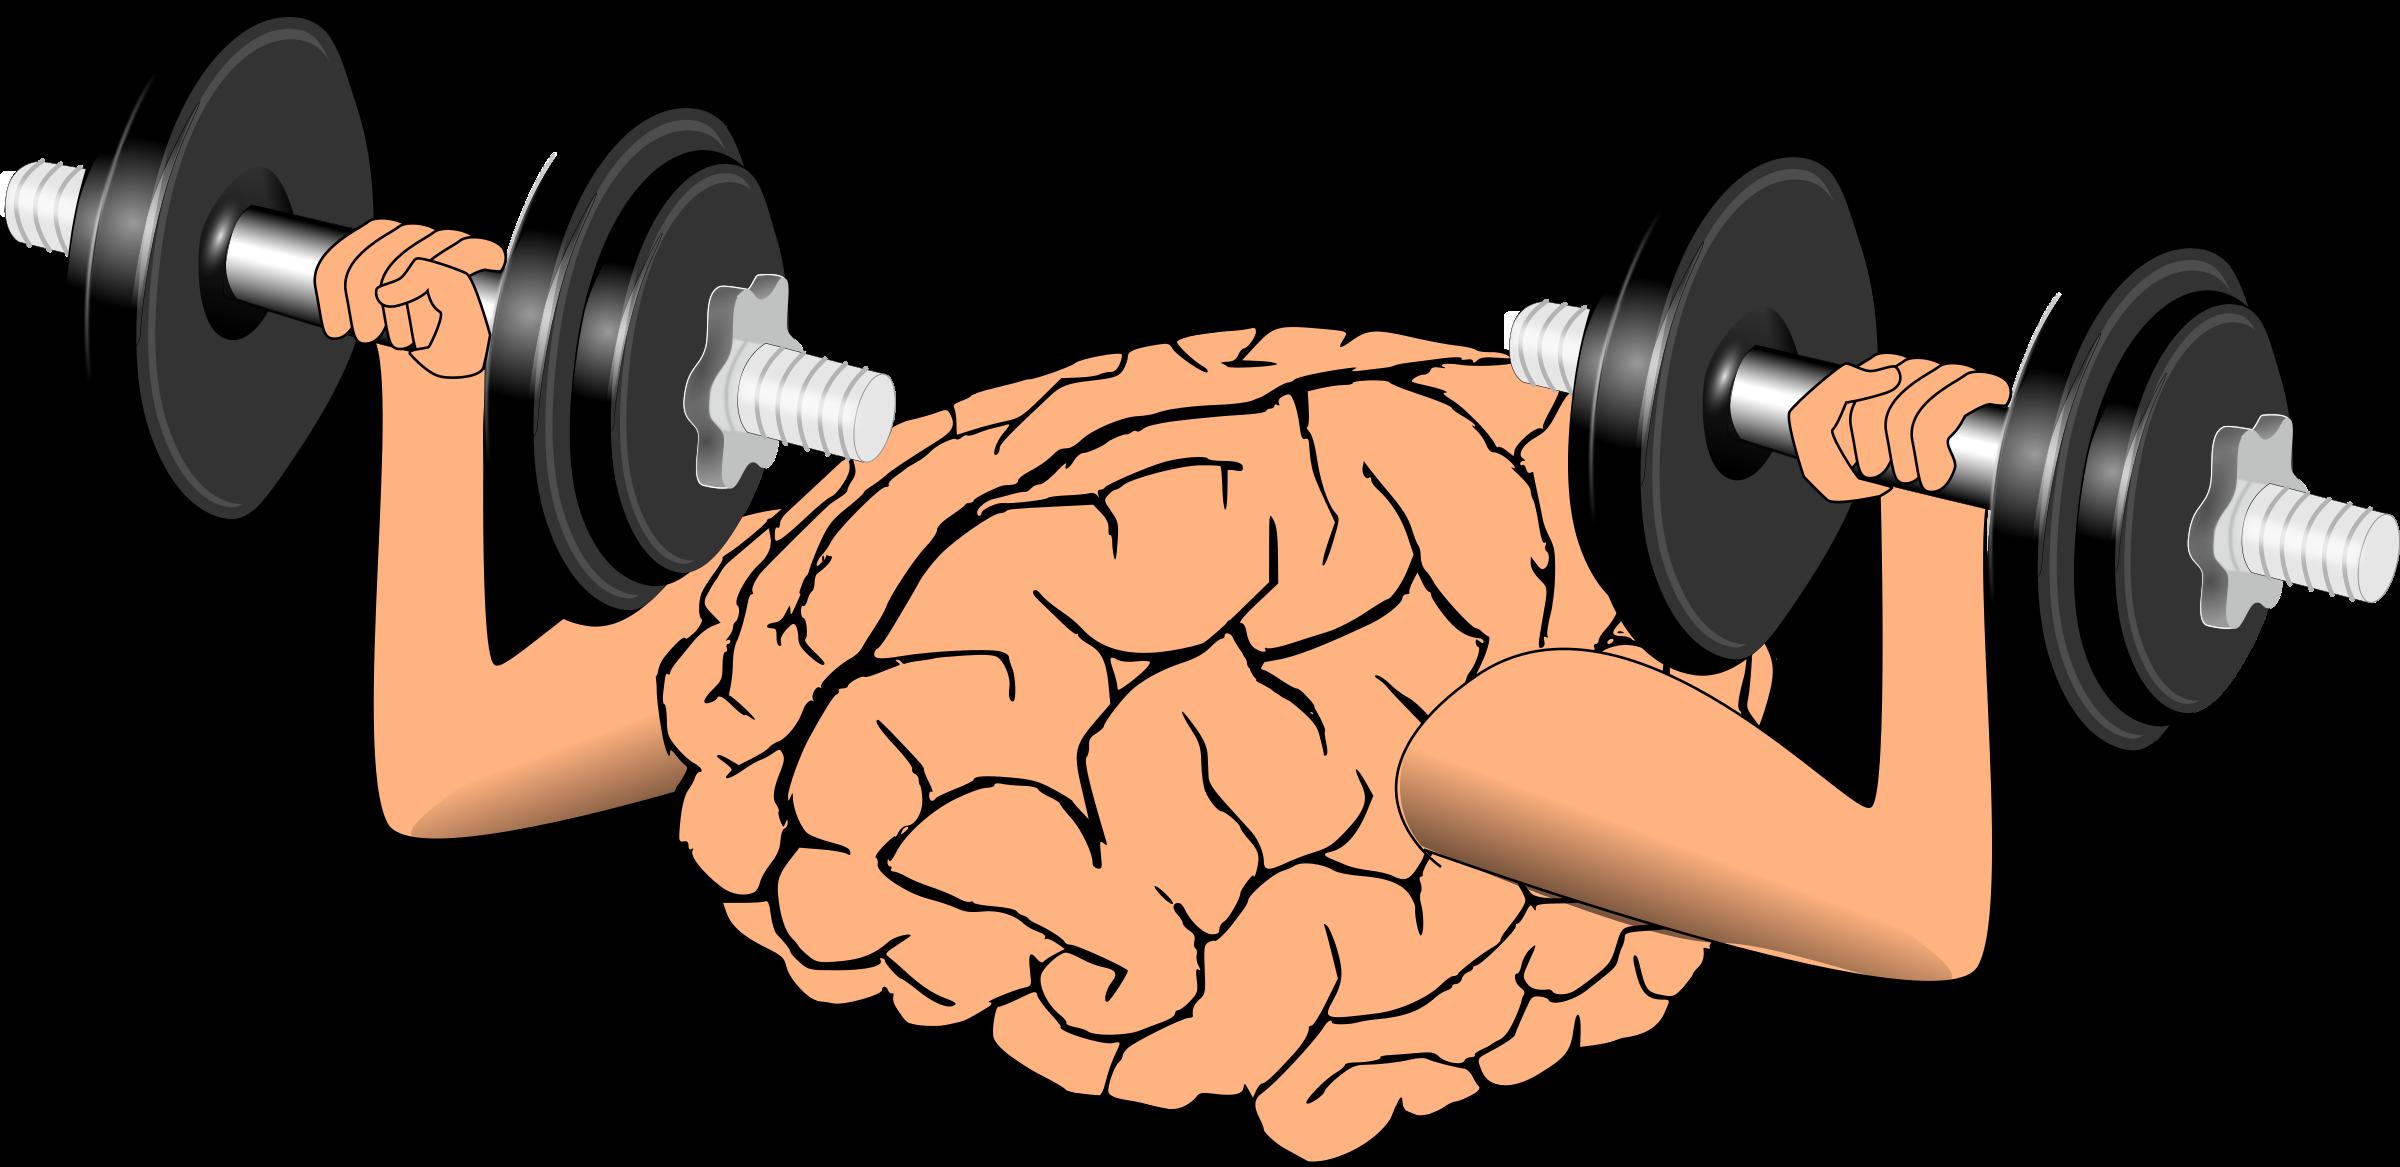 2400x1167 Brain Training Clip Art